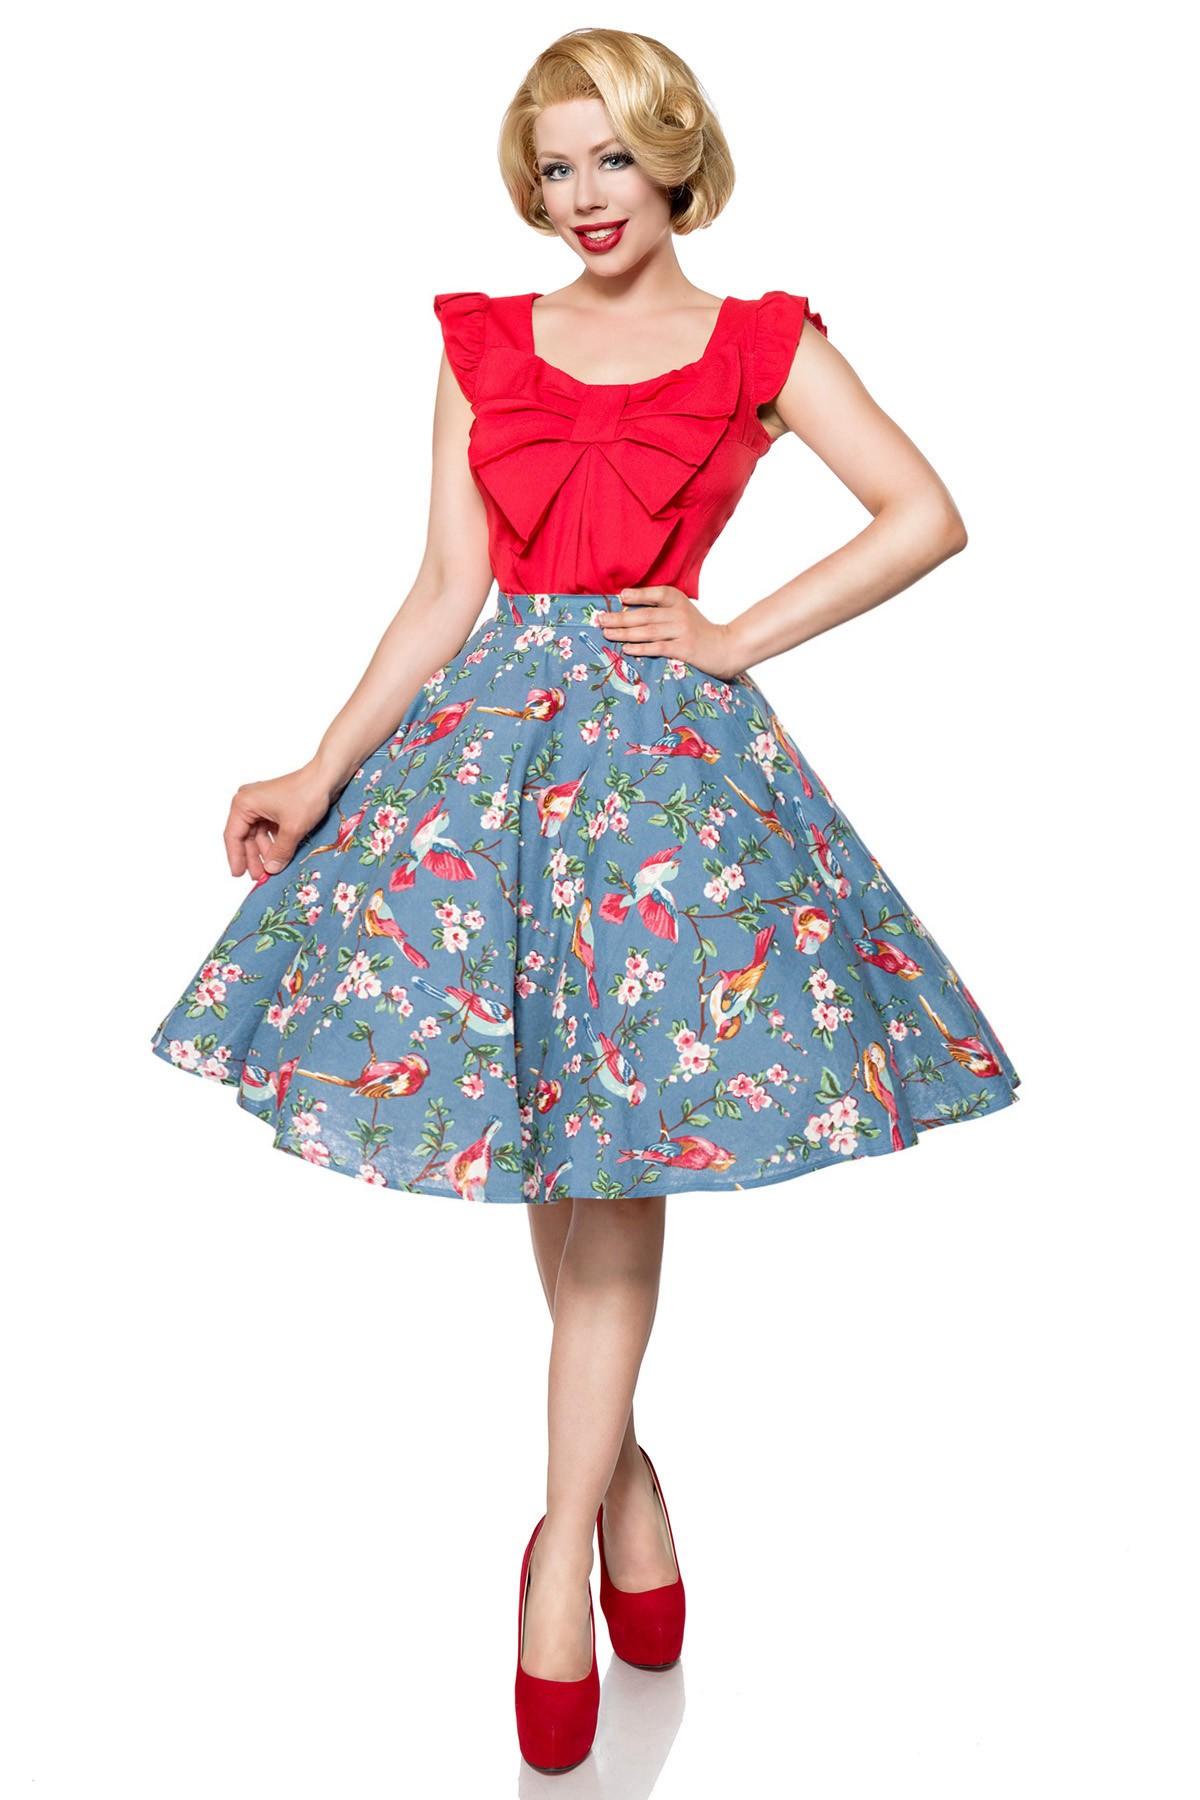 8402aa7940a7 Široká retro sukňa s botanickou potlačou Belsira - SELECTAFASHION.COM